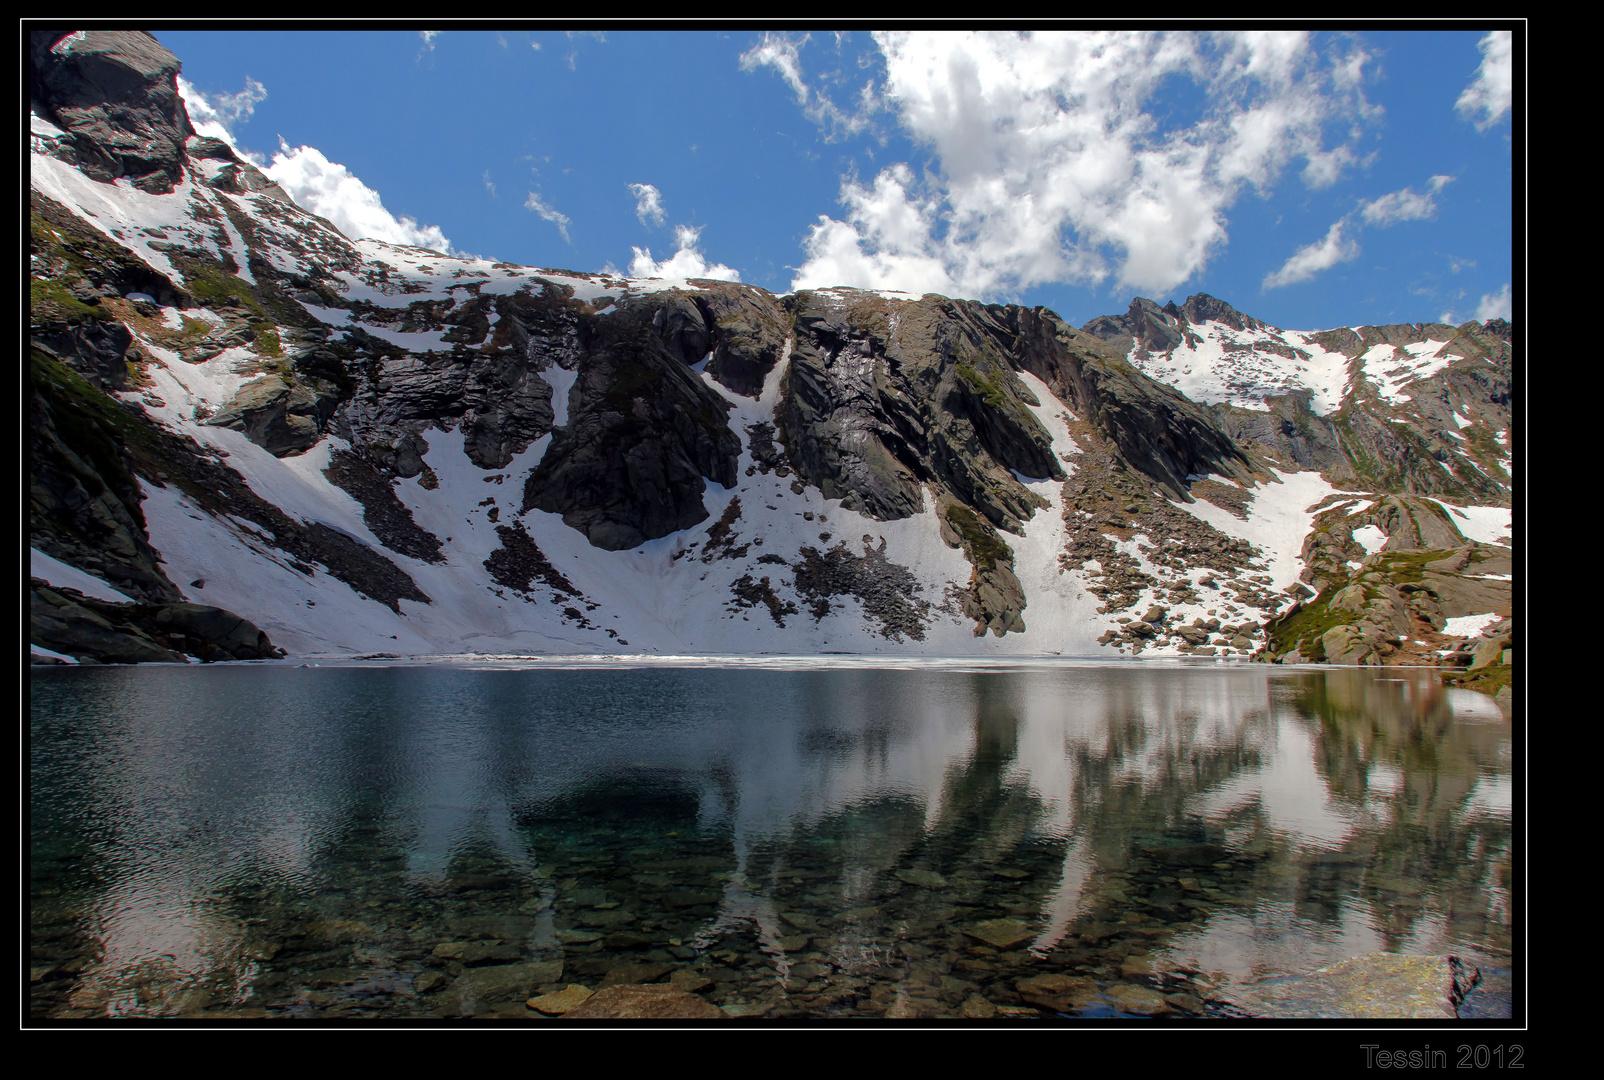 Tessin 2012 - Lago de Naret - im Spiegel